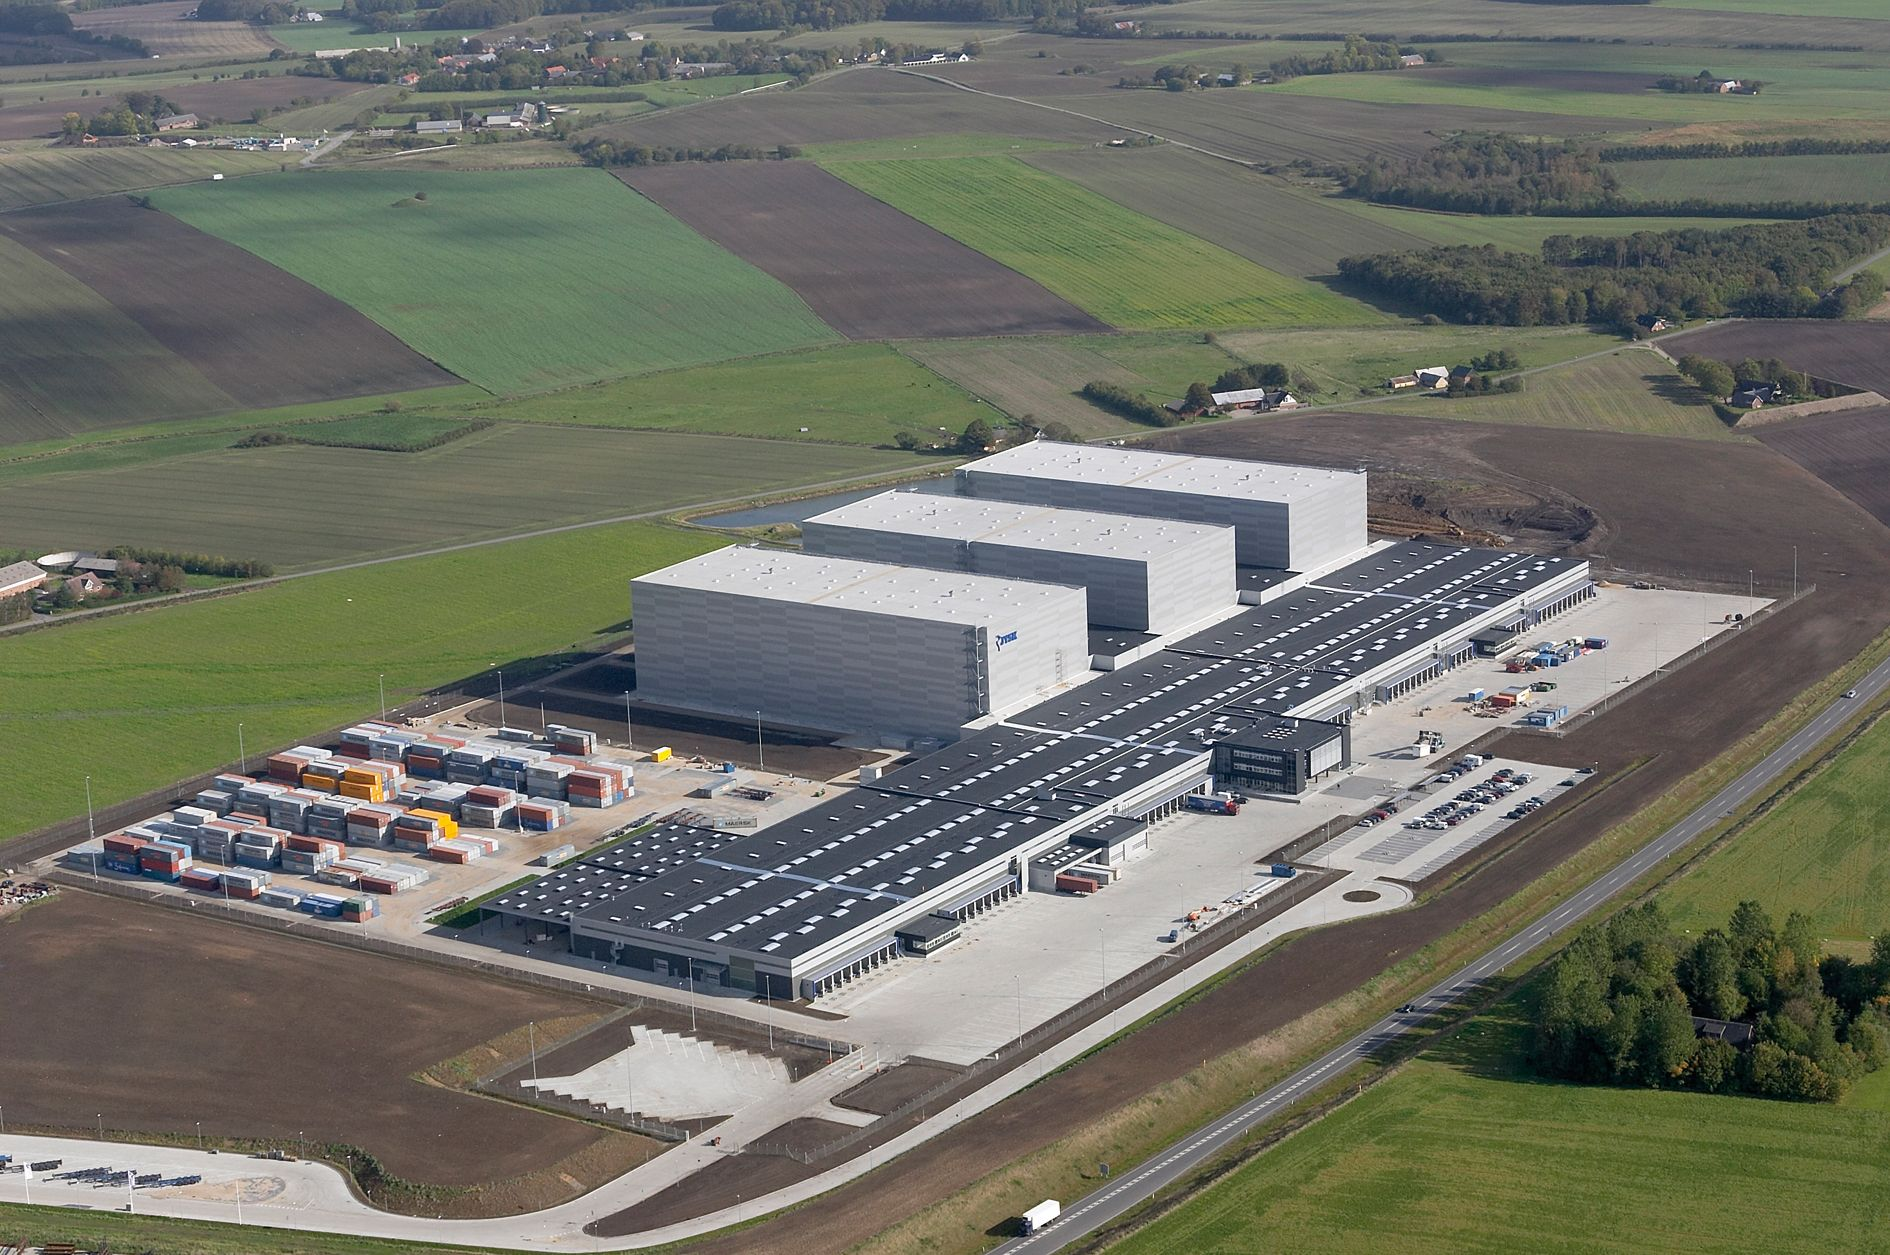 Skandinaviens største lager – JYSKs distributionscenter i Uldum – åbner i år. Det har kostet 750 mio. kr. – matrikelarealet svarer til 48 fodboldbaner. Akkreditering: JW luftfoto.